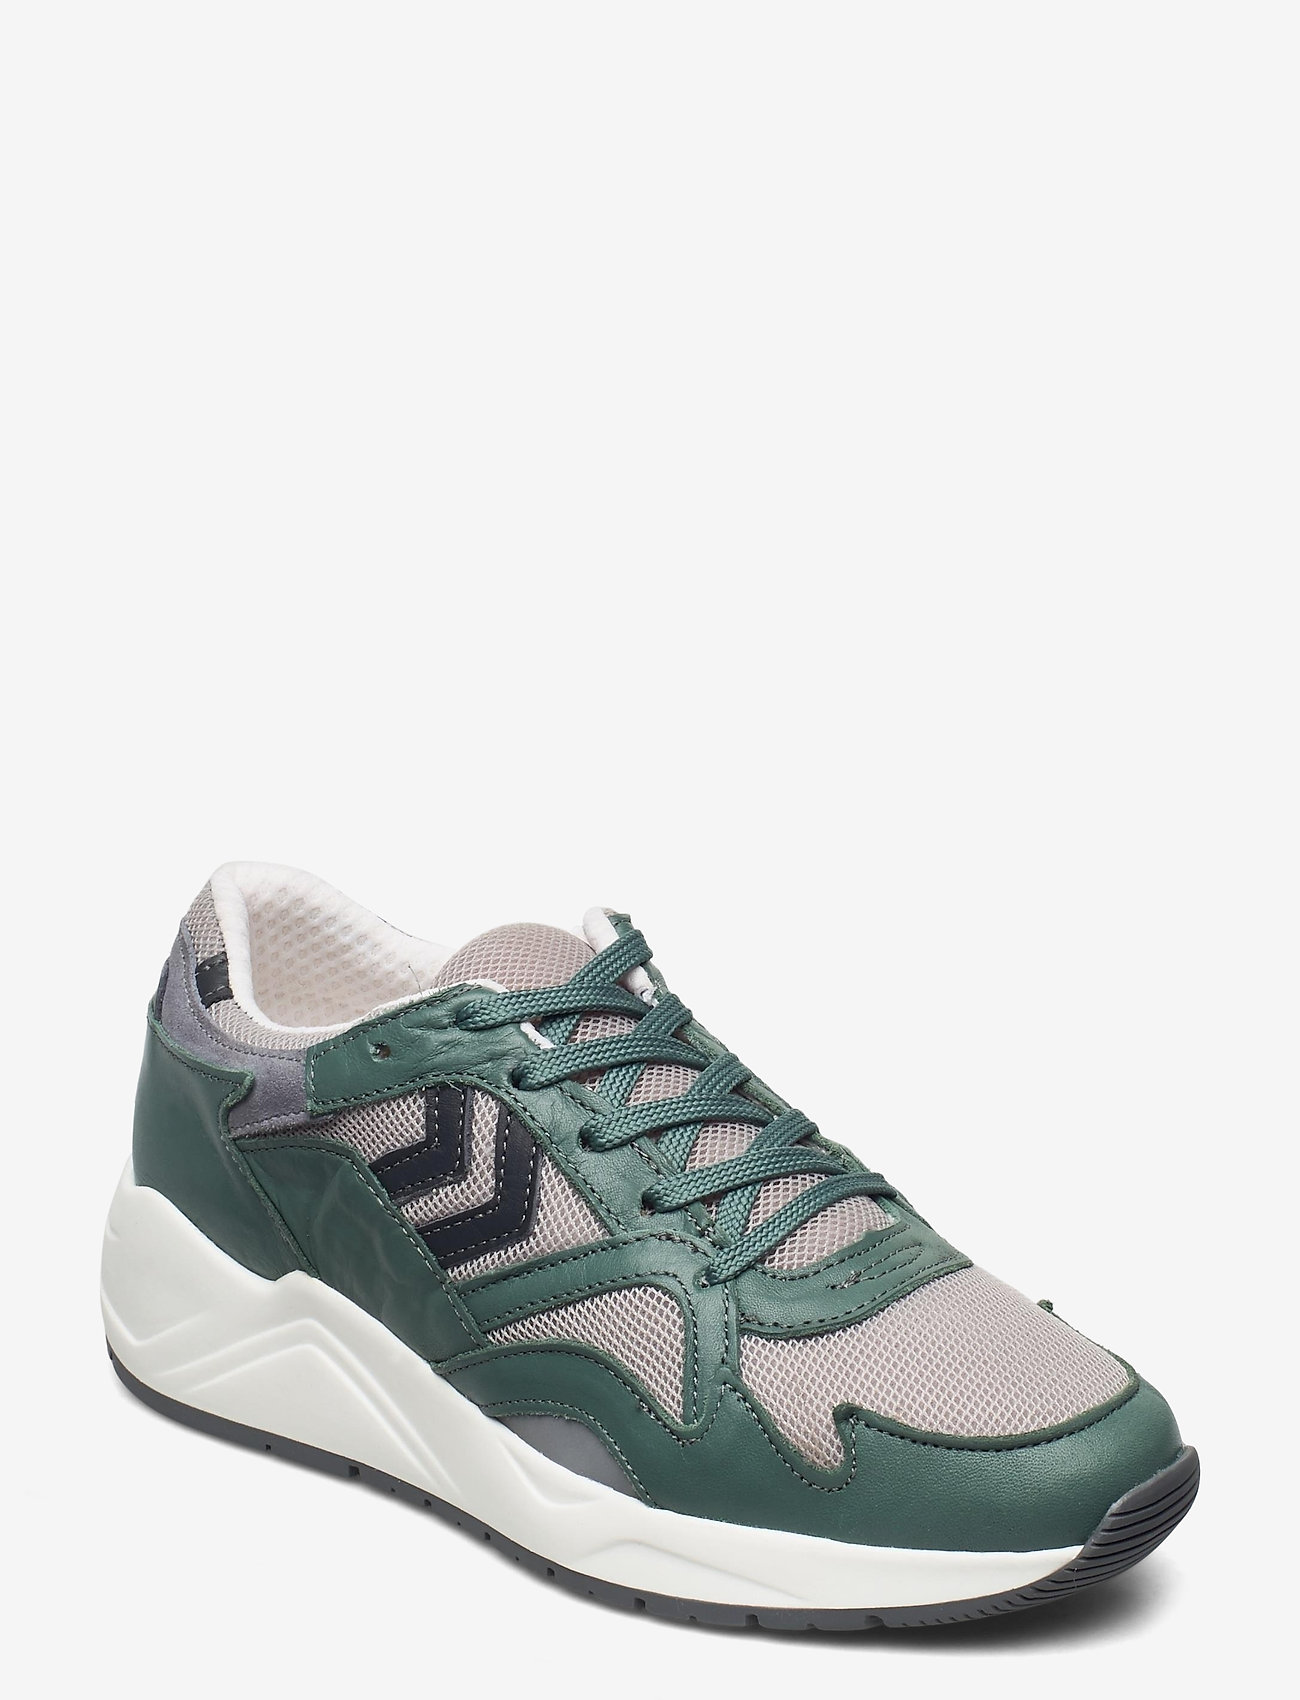 Hummel - EDMONTON HIVE - laag sneakers - dusty olive - 1